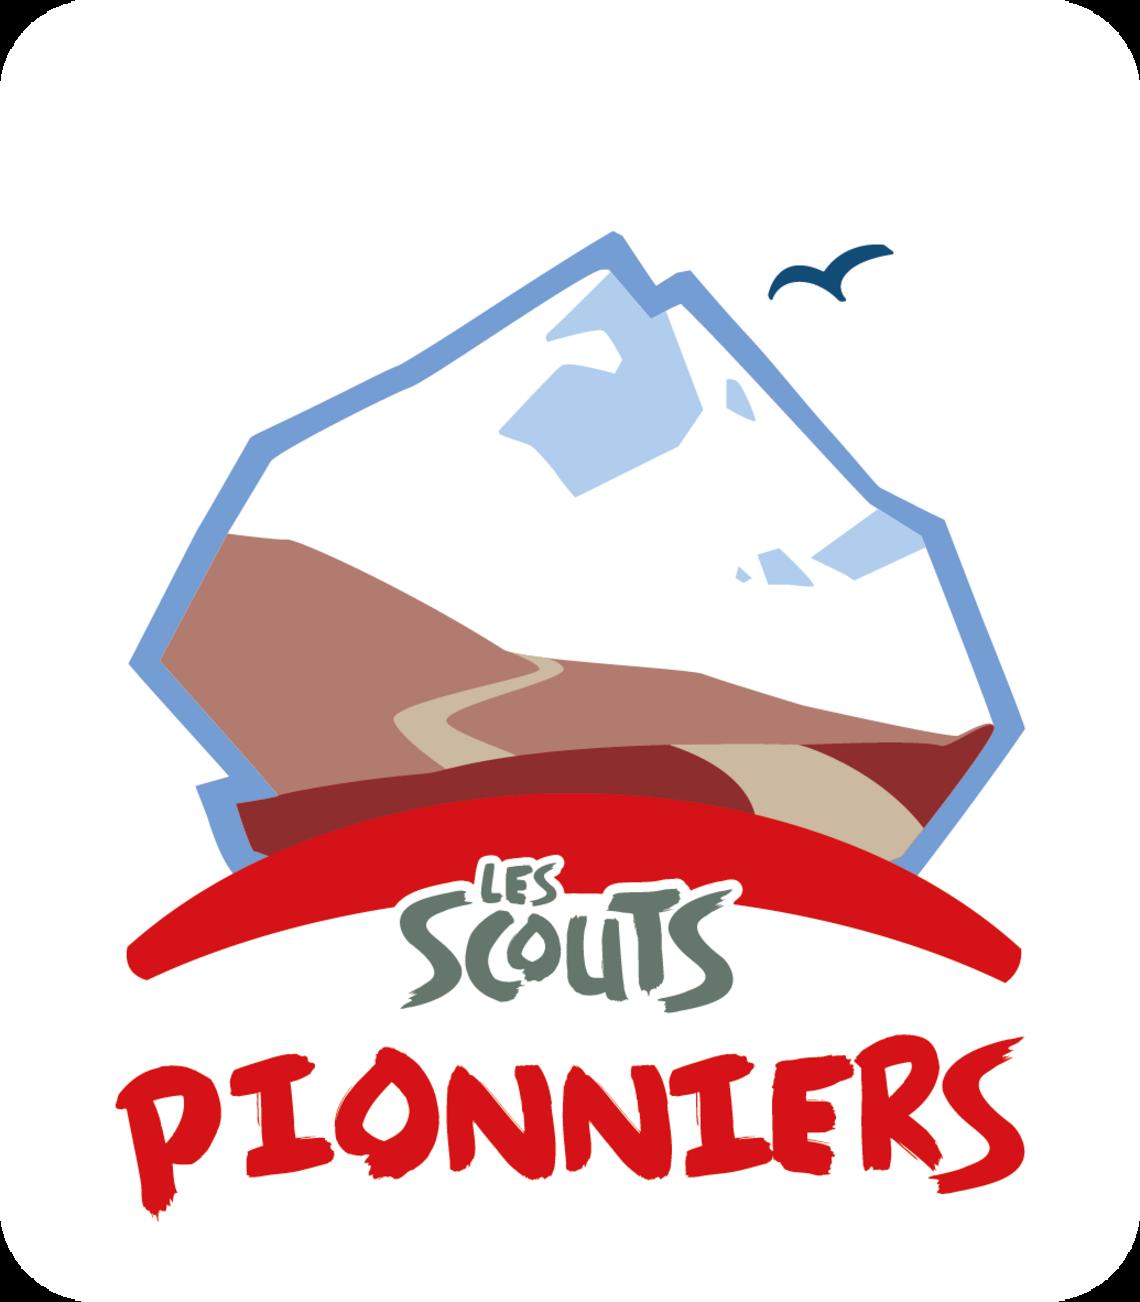 Pionniers 17-18 ans